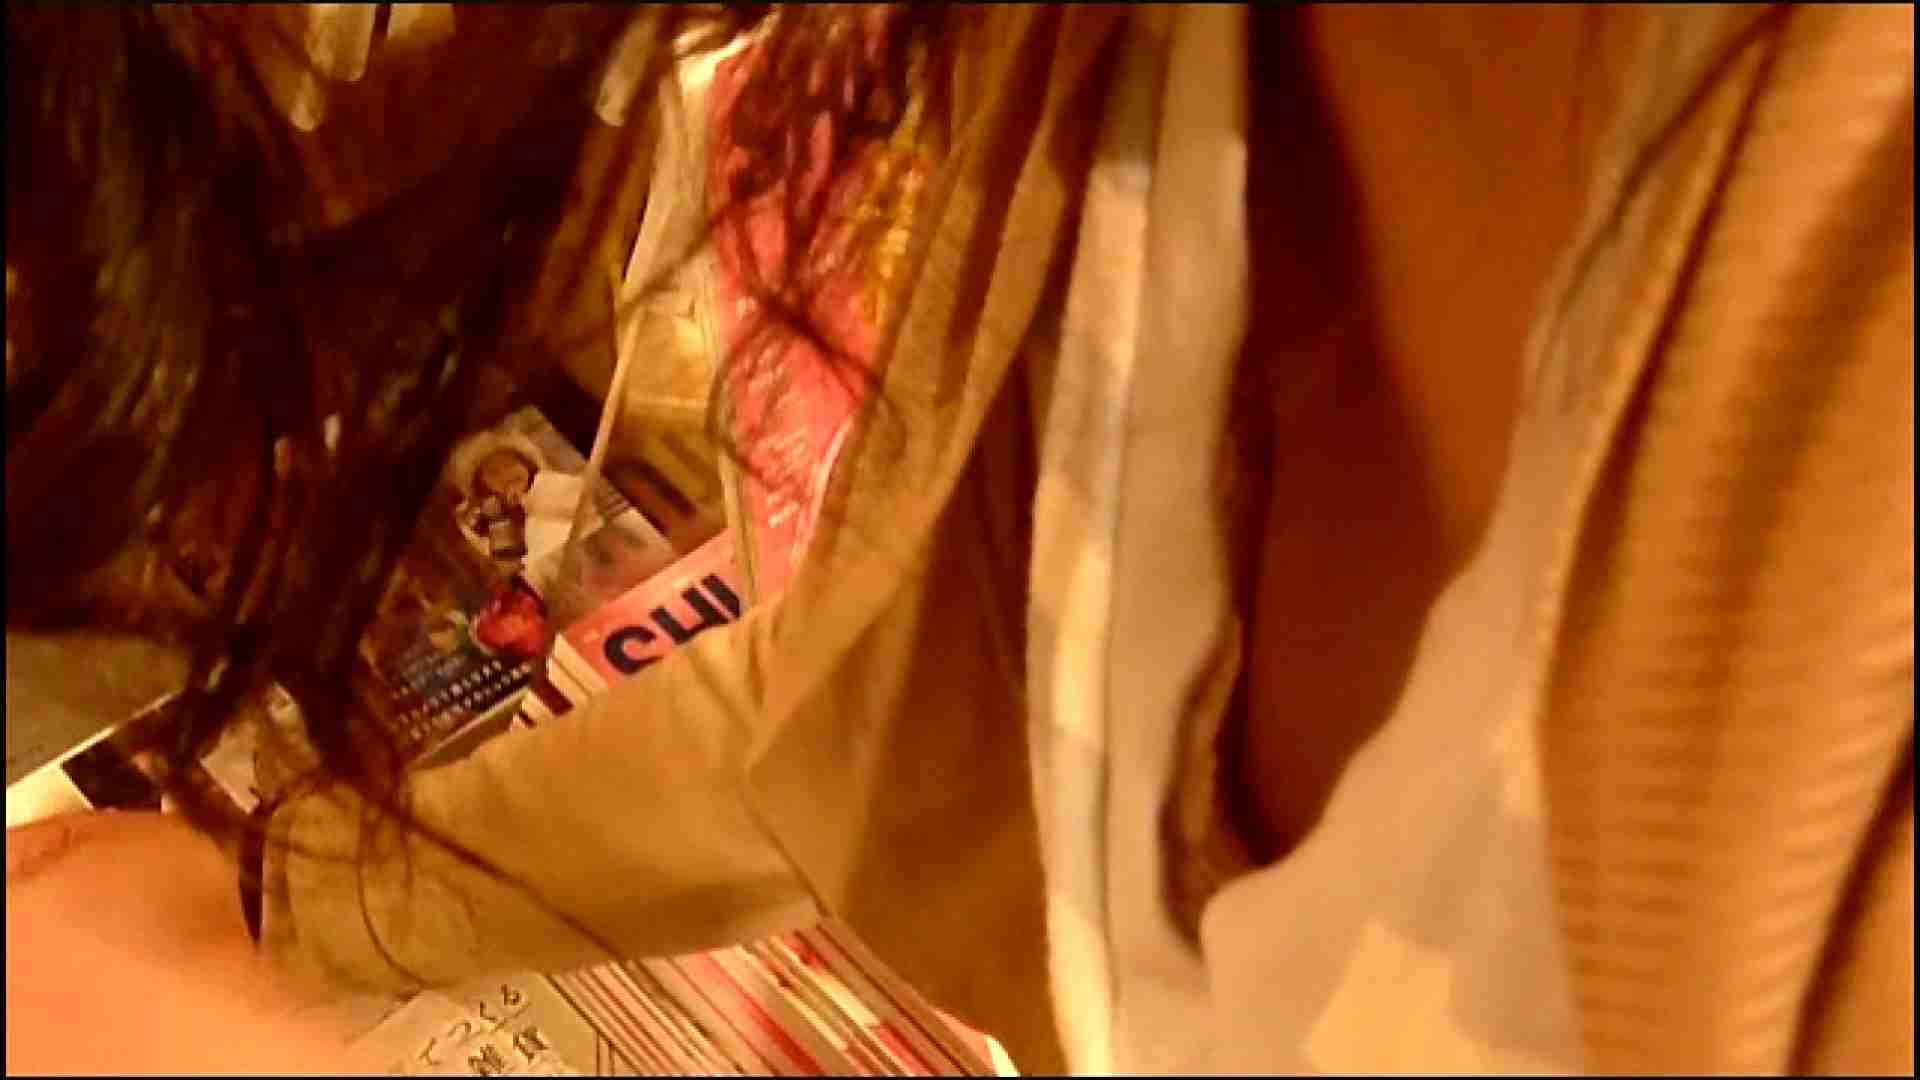 NO.3 某イオNN店内のエレベーター前でケータイに夢中な女の子 お姉さんの胸チラ  46画像 9